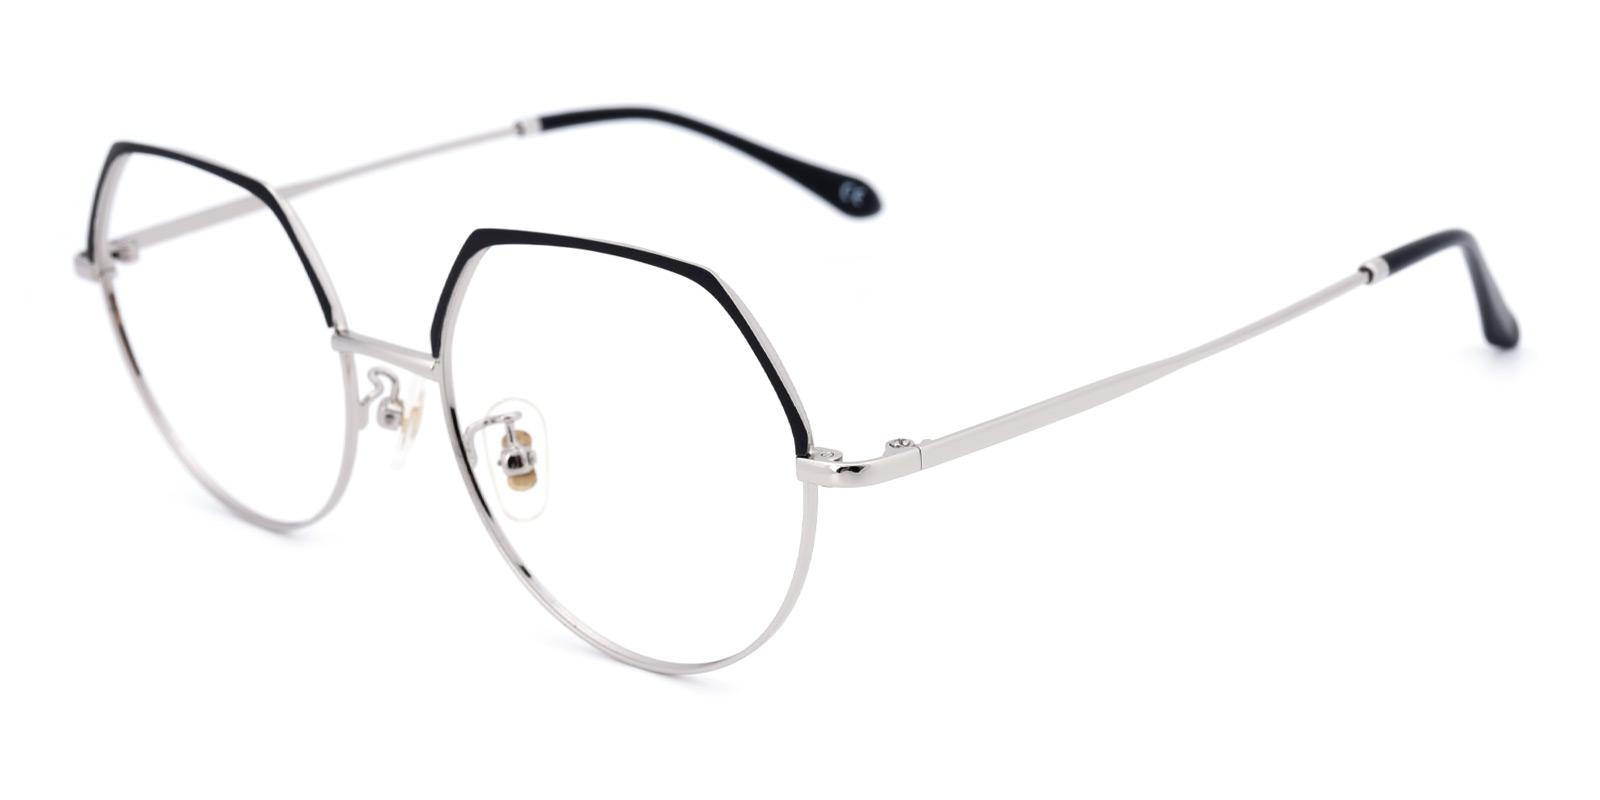 Advice-Black-Round-Metal-Eyeglasses-detail